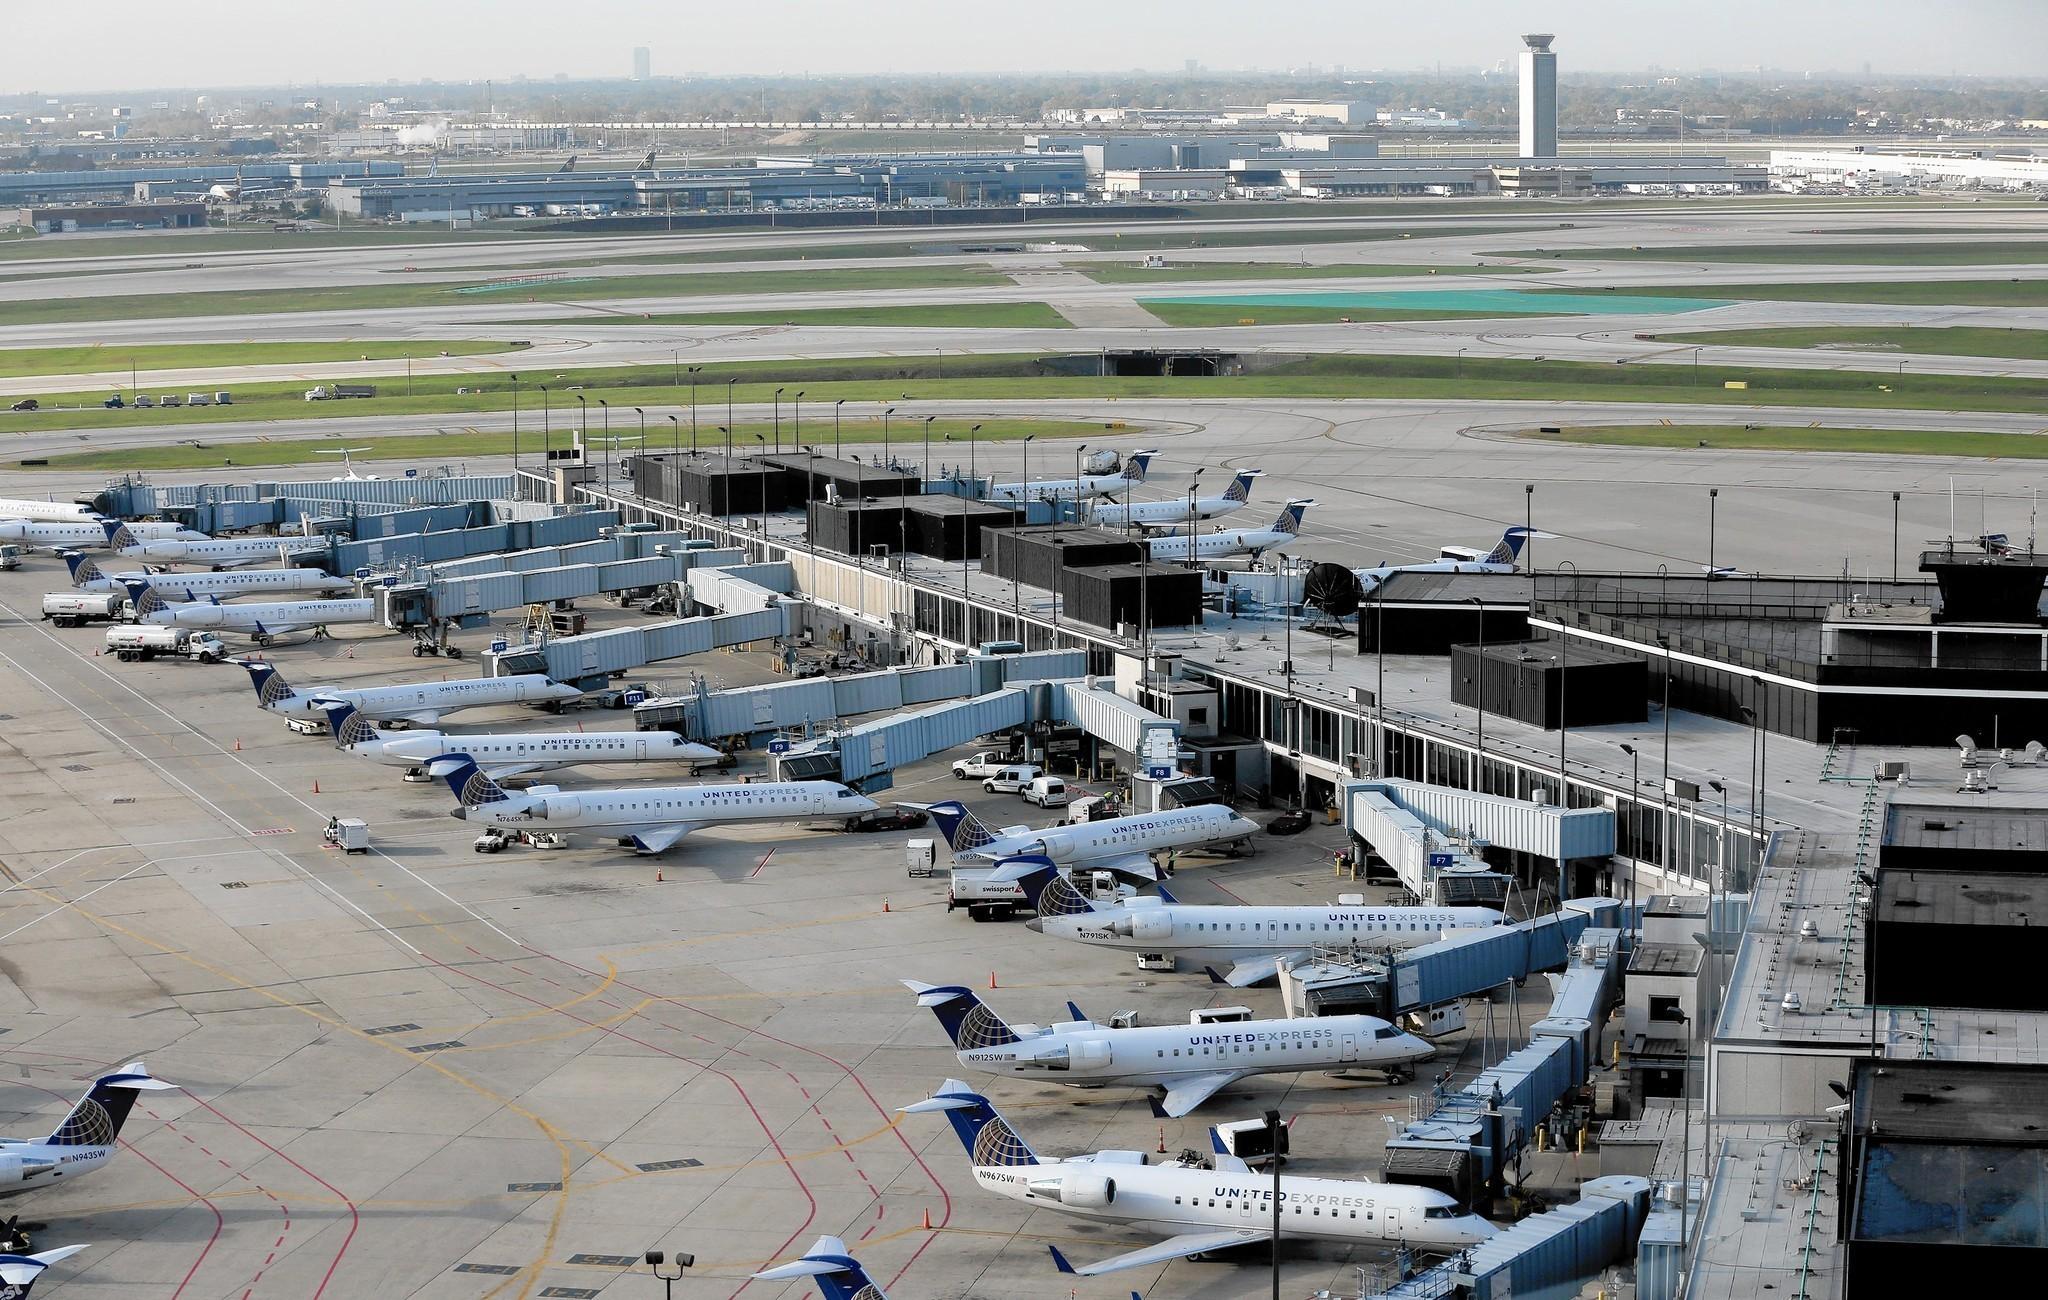 Ct-domestic-airfares-down-0727-biz-20160726